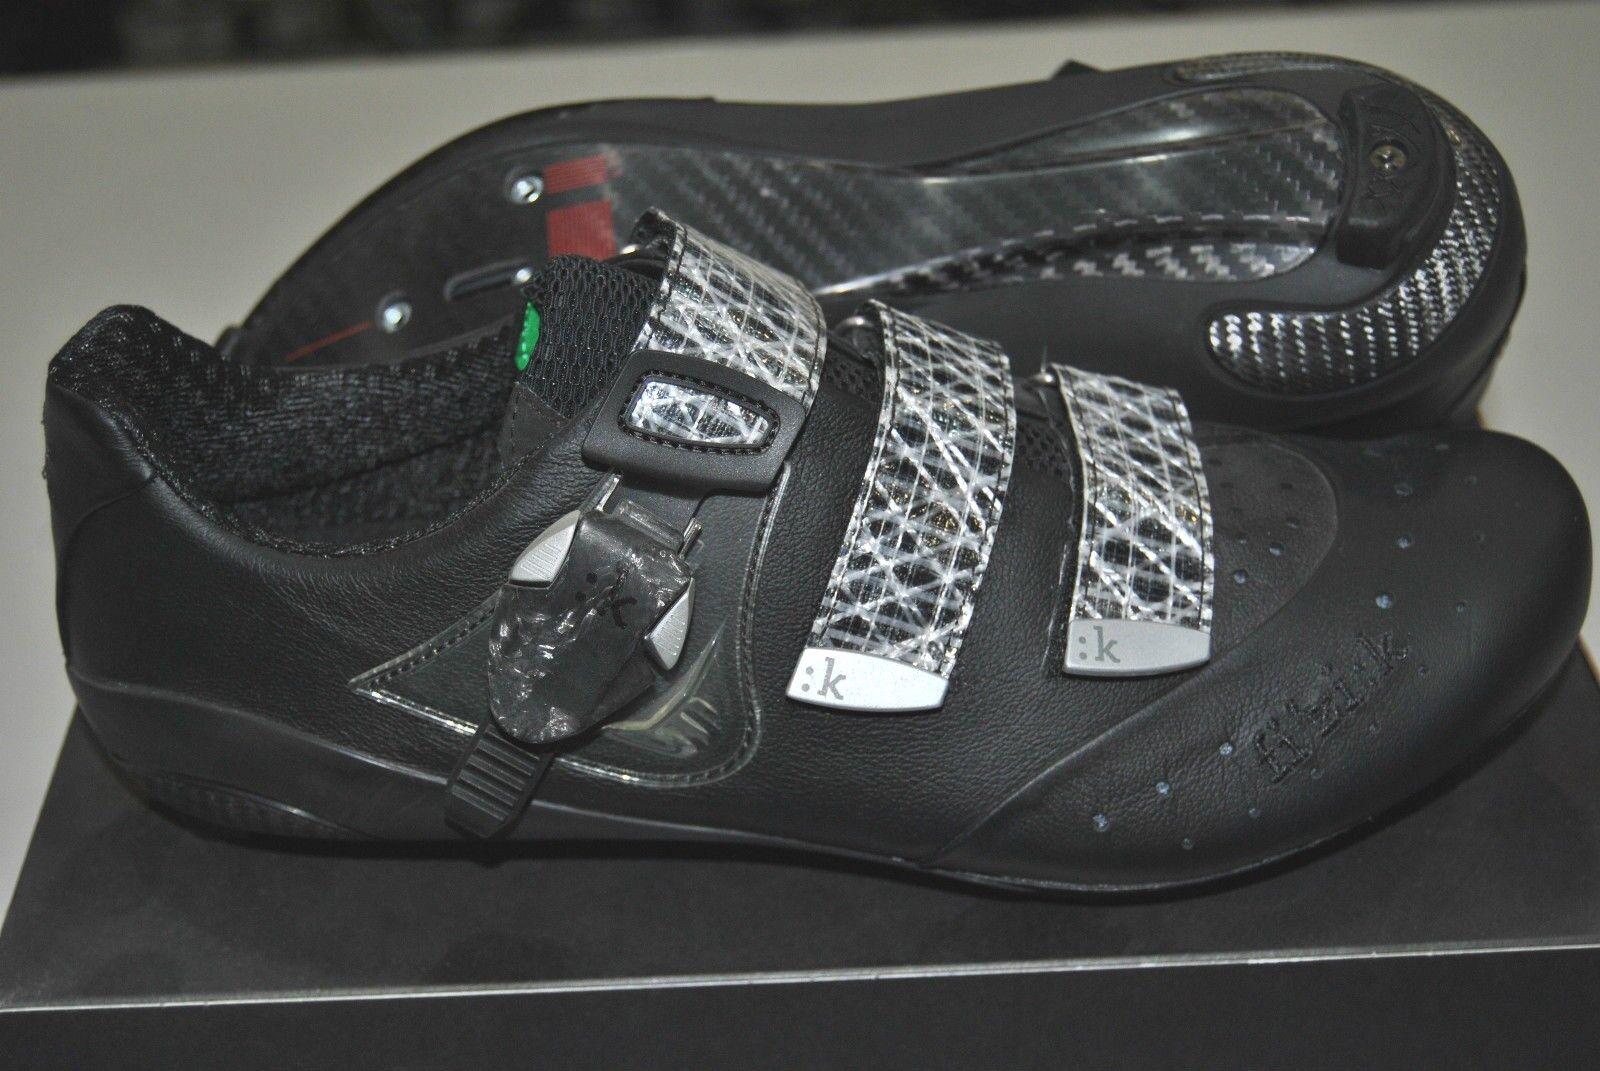 Schuhe Road Fizik R1 Kohlenstoff Schwarz   schuhe R1